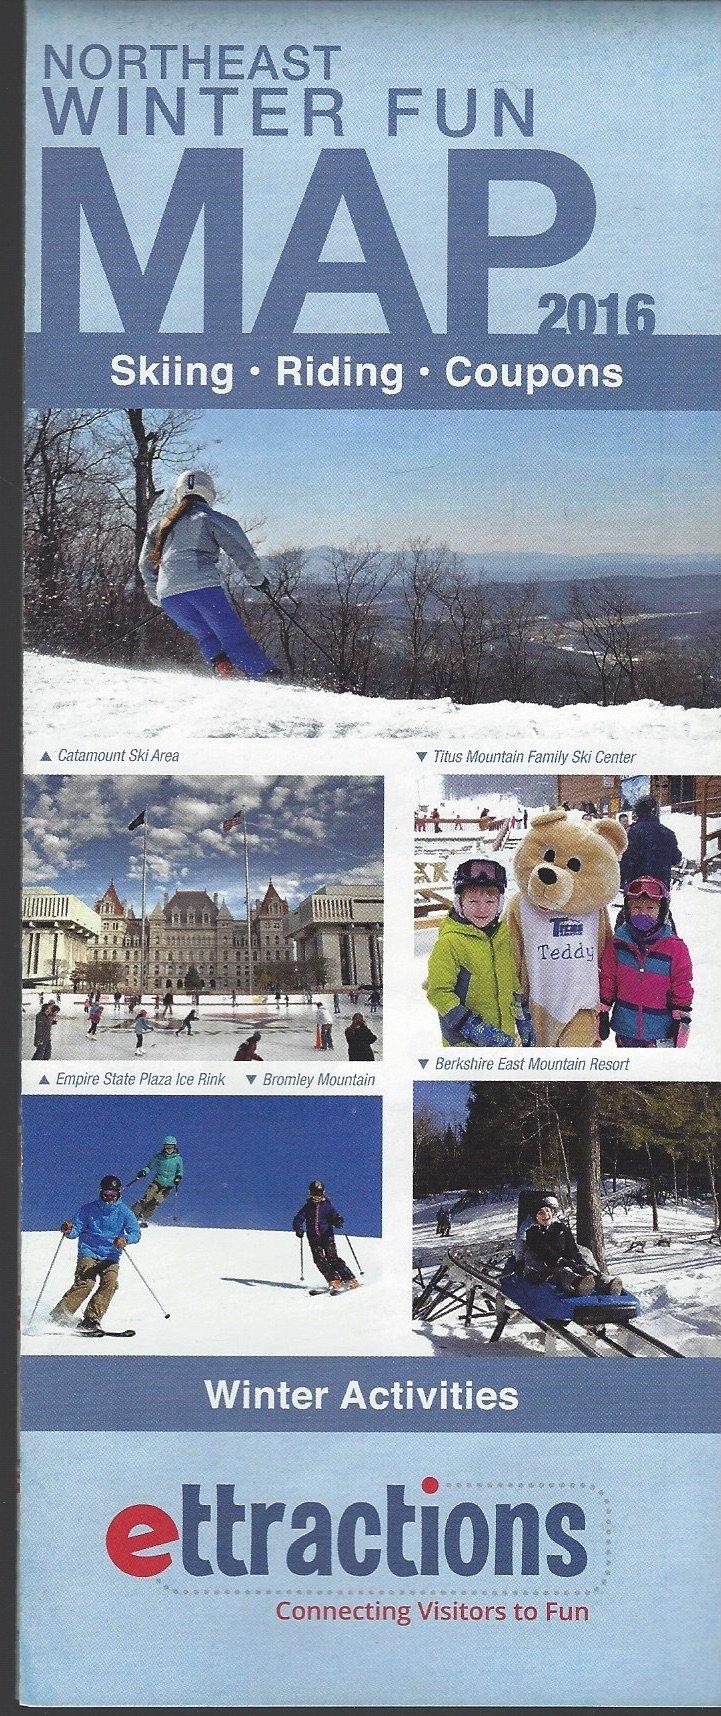 Northeast Winter Fun Map 2016: Skiing, Riding, s ... on ski resort ny state, ski upstate new york map, ski resorts map of new york city, mountains of new york map, skiing near new york map, new york ski resort area map, new york ski mountains map, ski new england map, ski new mexico map, ski west mountain new york, ski slopes in ny,